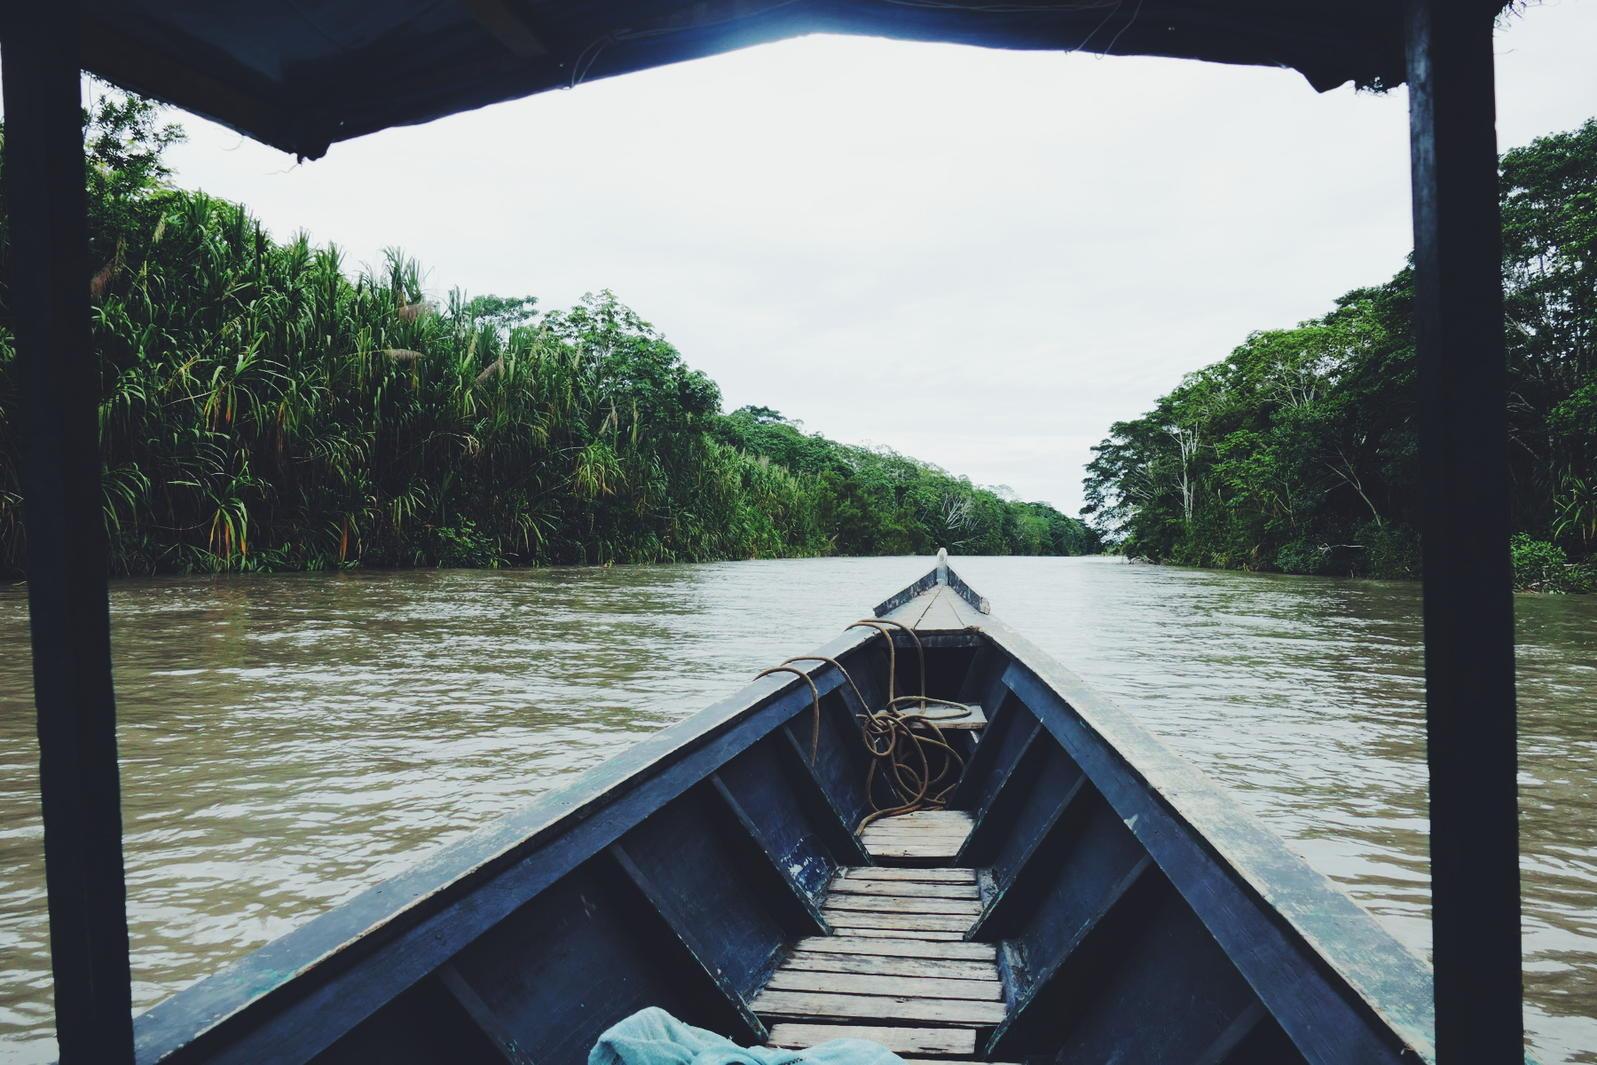 Heading up the Madre de Dios River in southeast Peru. Noah Strycker